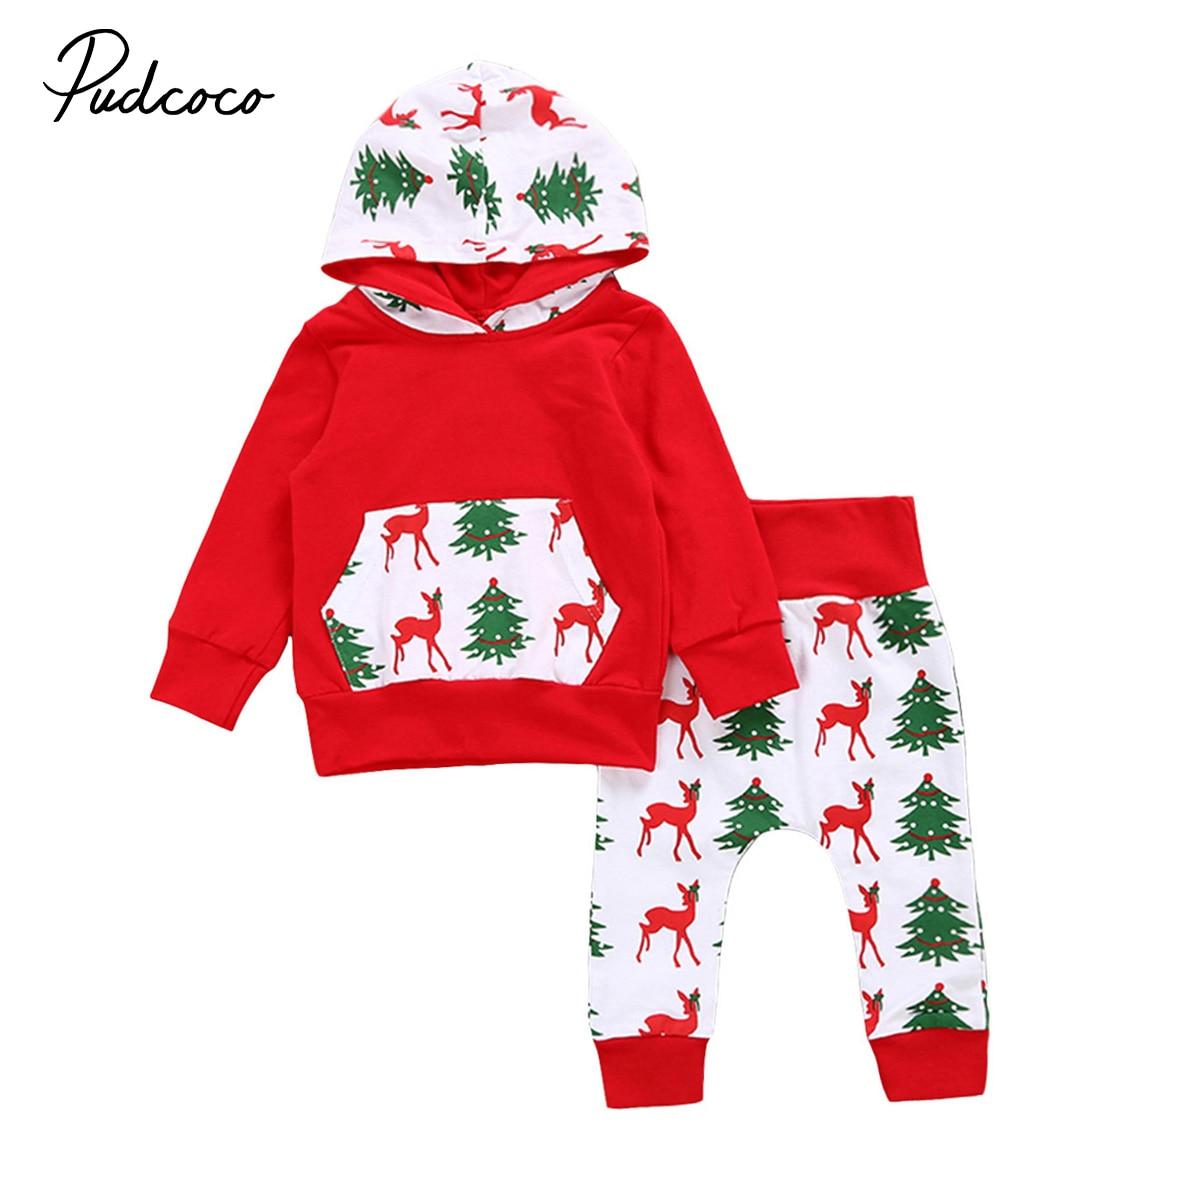 PUDCOCO 2017 Newest Christmas Baby Girl Boy Clothes Hoodie Tops+Long Pants Fresh set 0-24M 2pcs set baby clothes set boy